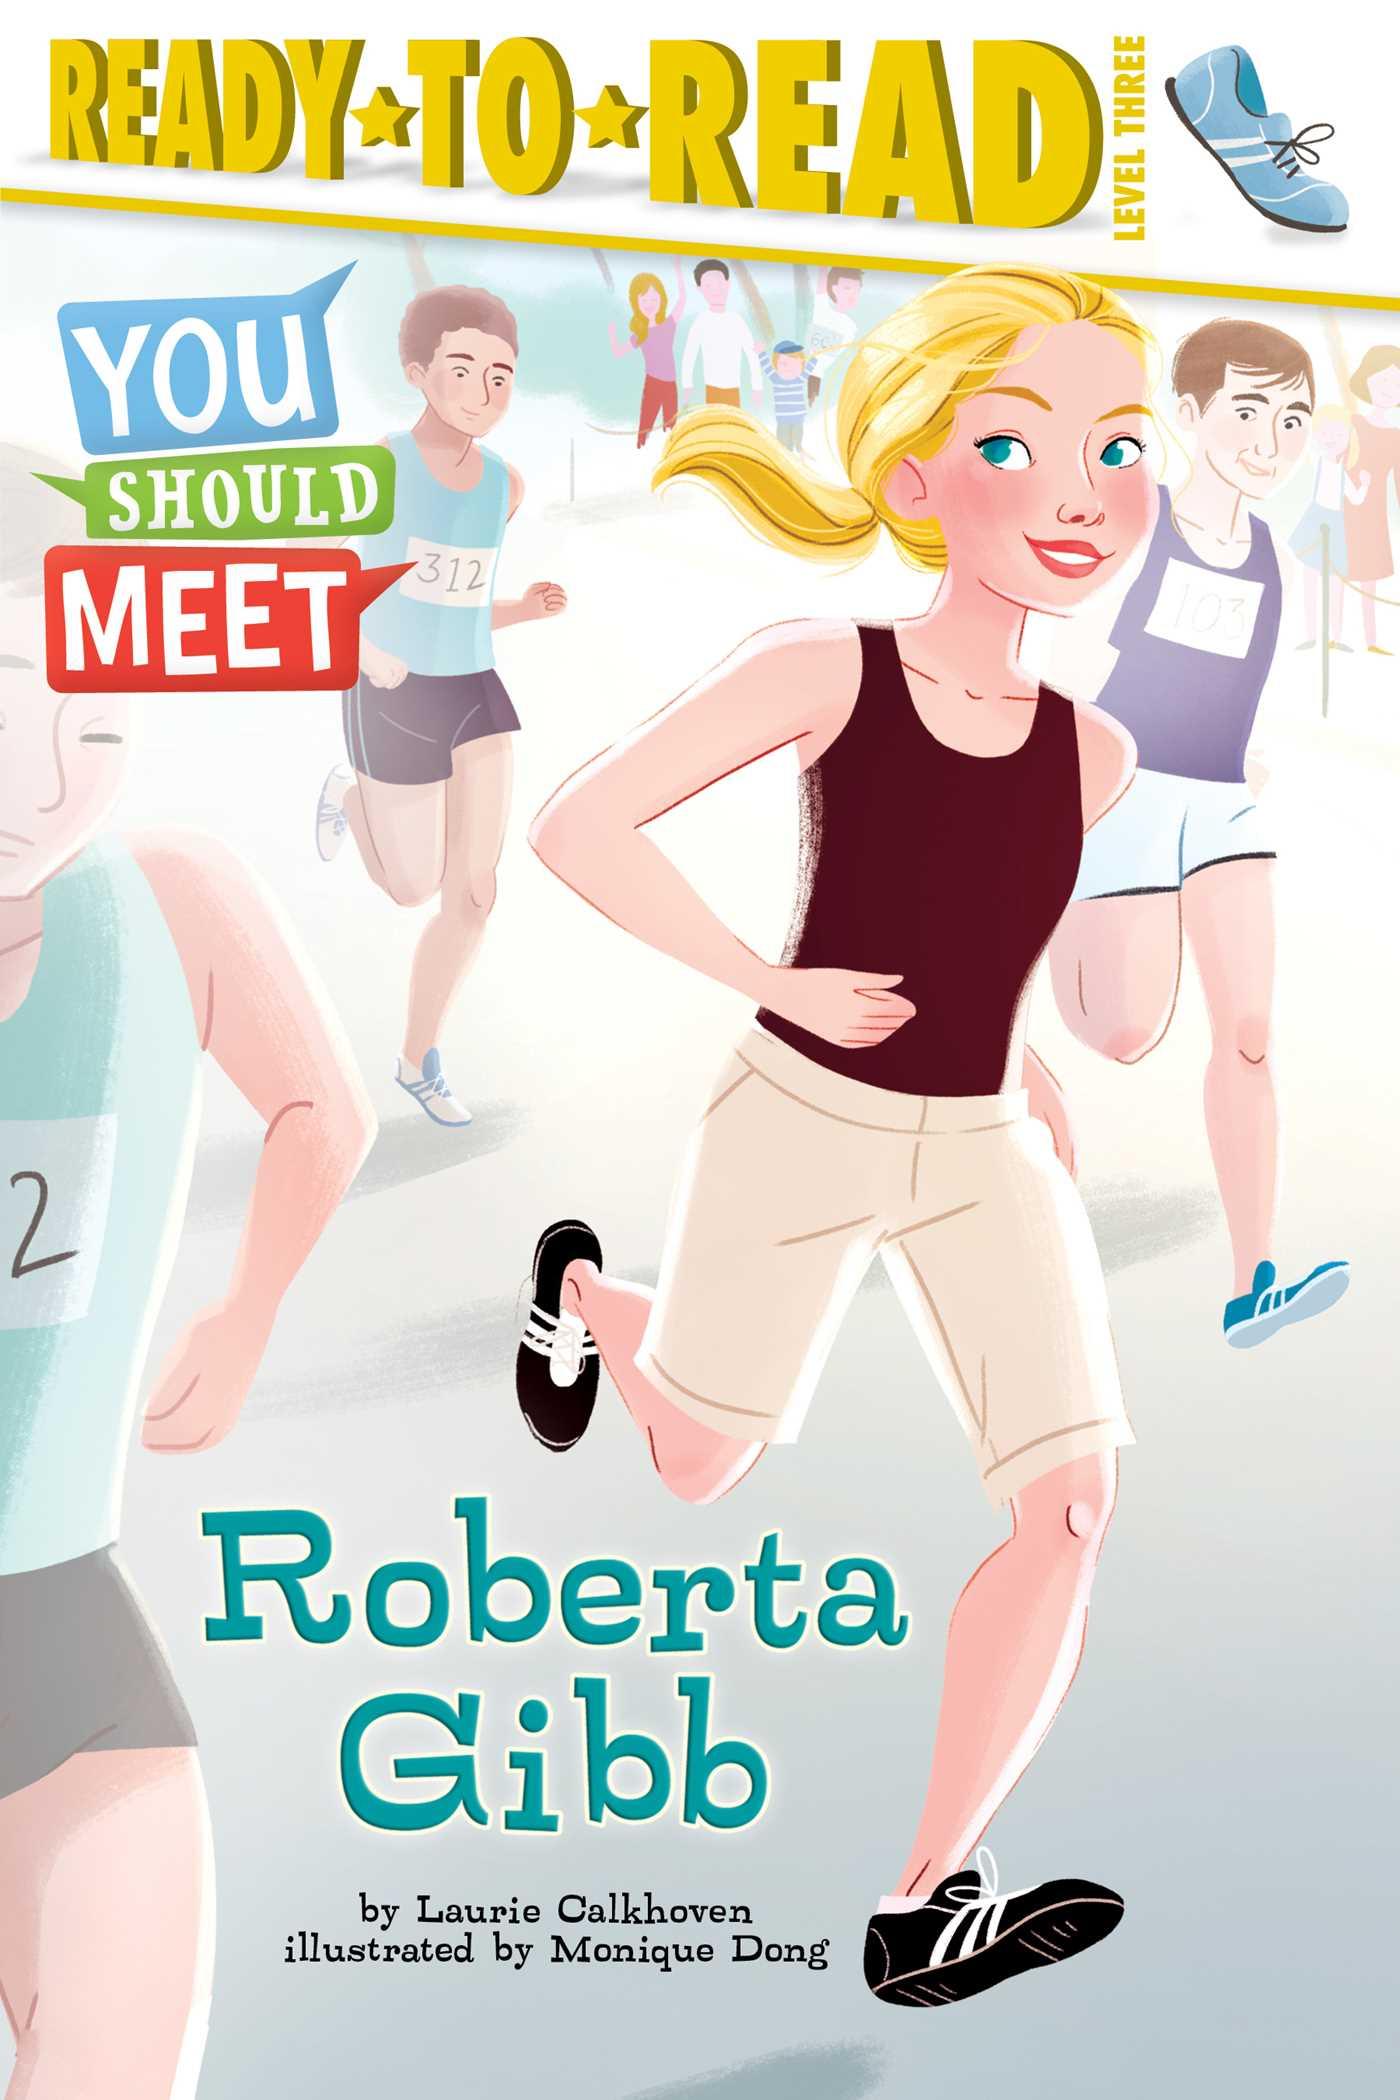 Roberta gibb 9781534409712 hr